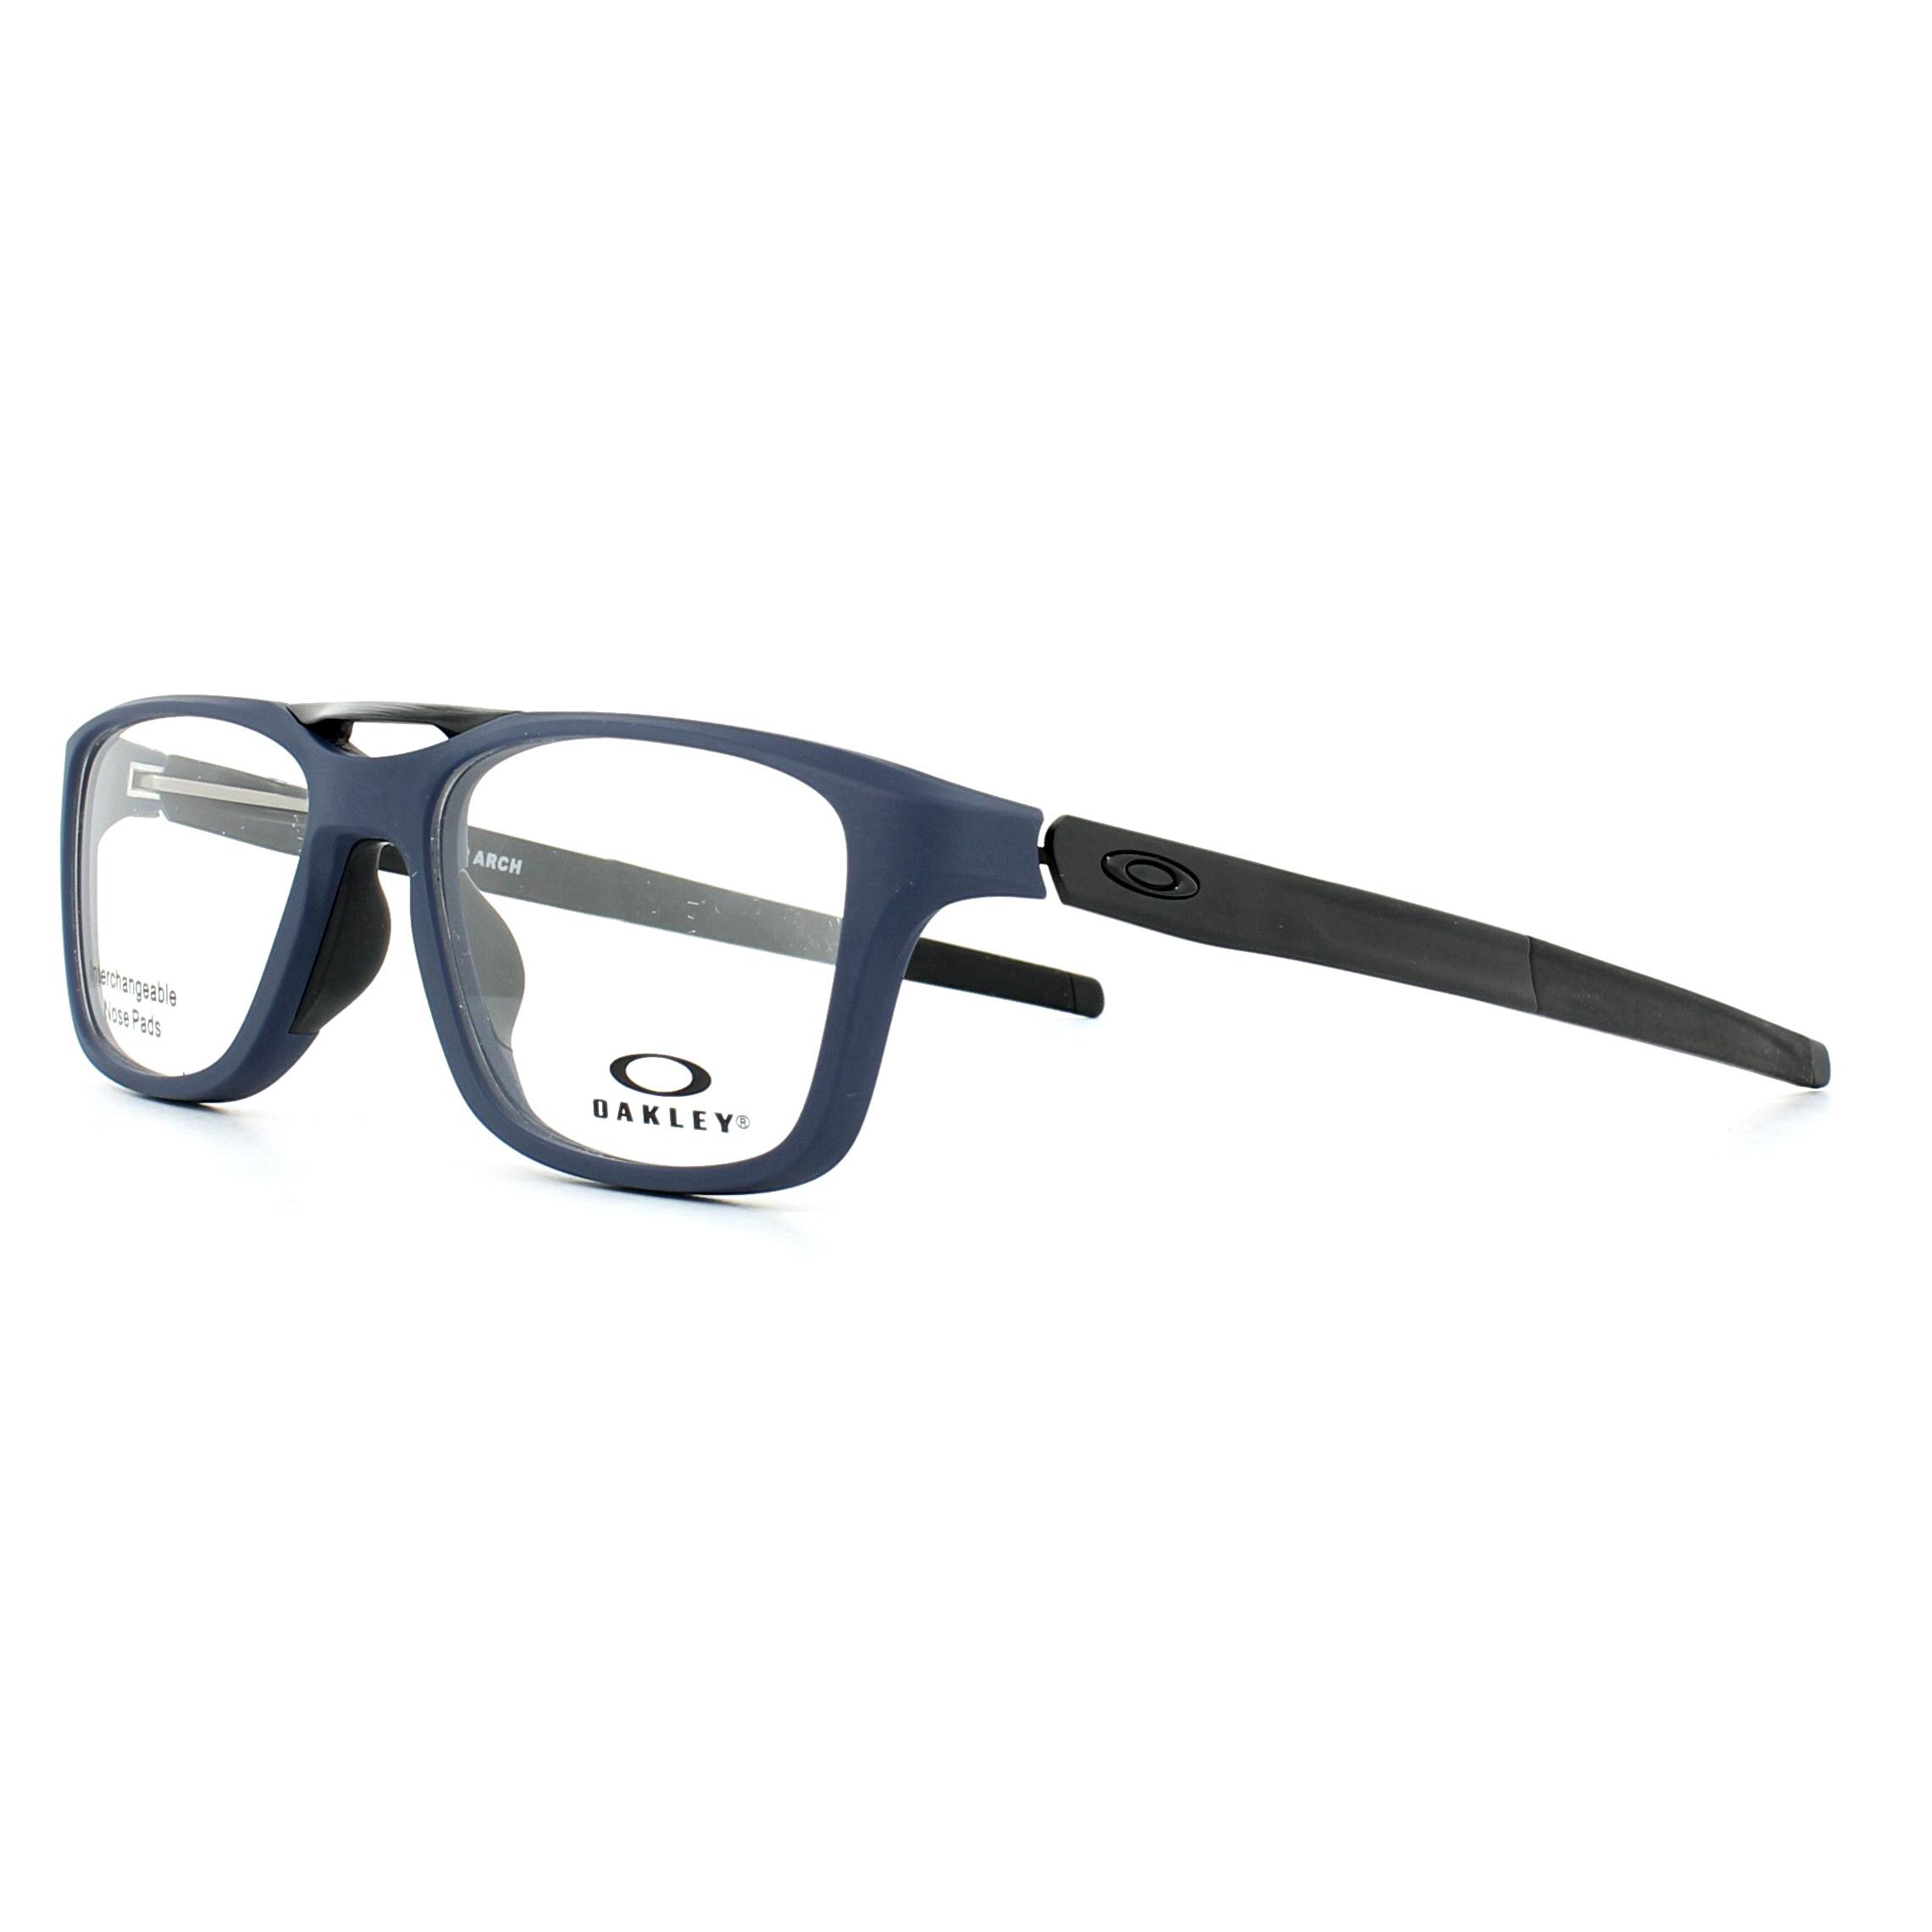 c74a01ac1e Sentinel Oakley Glasses Frames Gauge 7.2 Trubridge OX8113-03 Universe Blue  53mm Mens